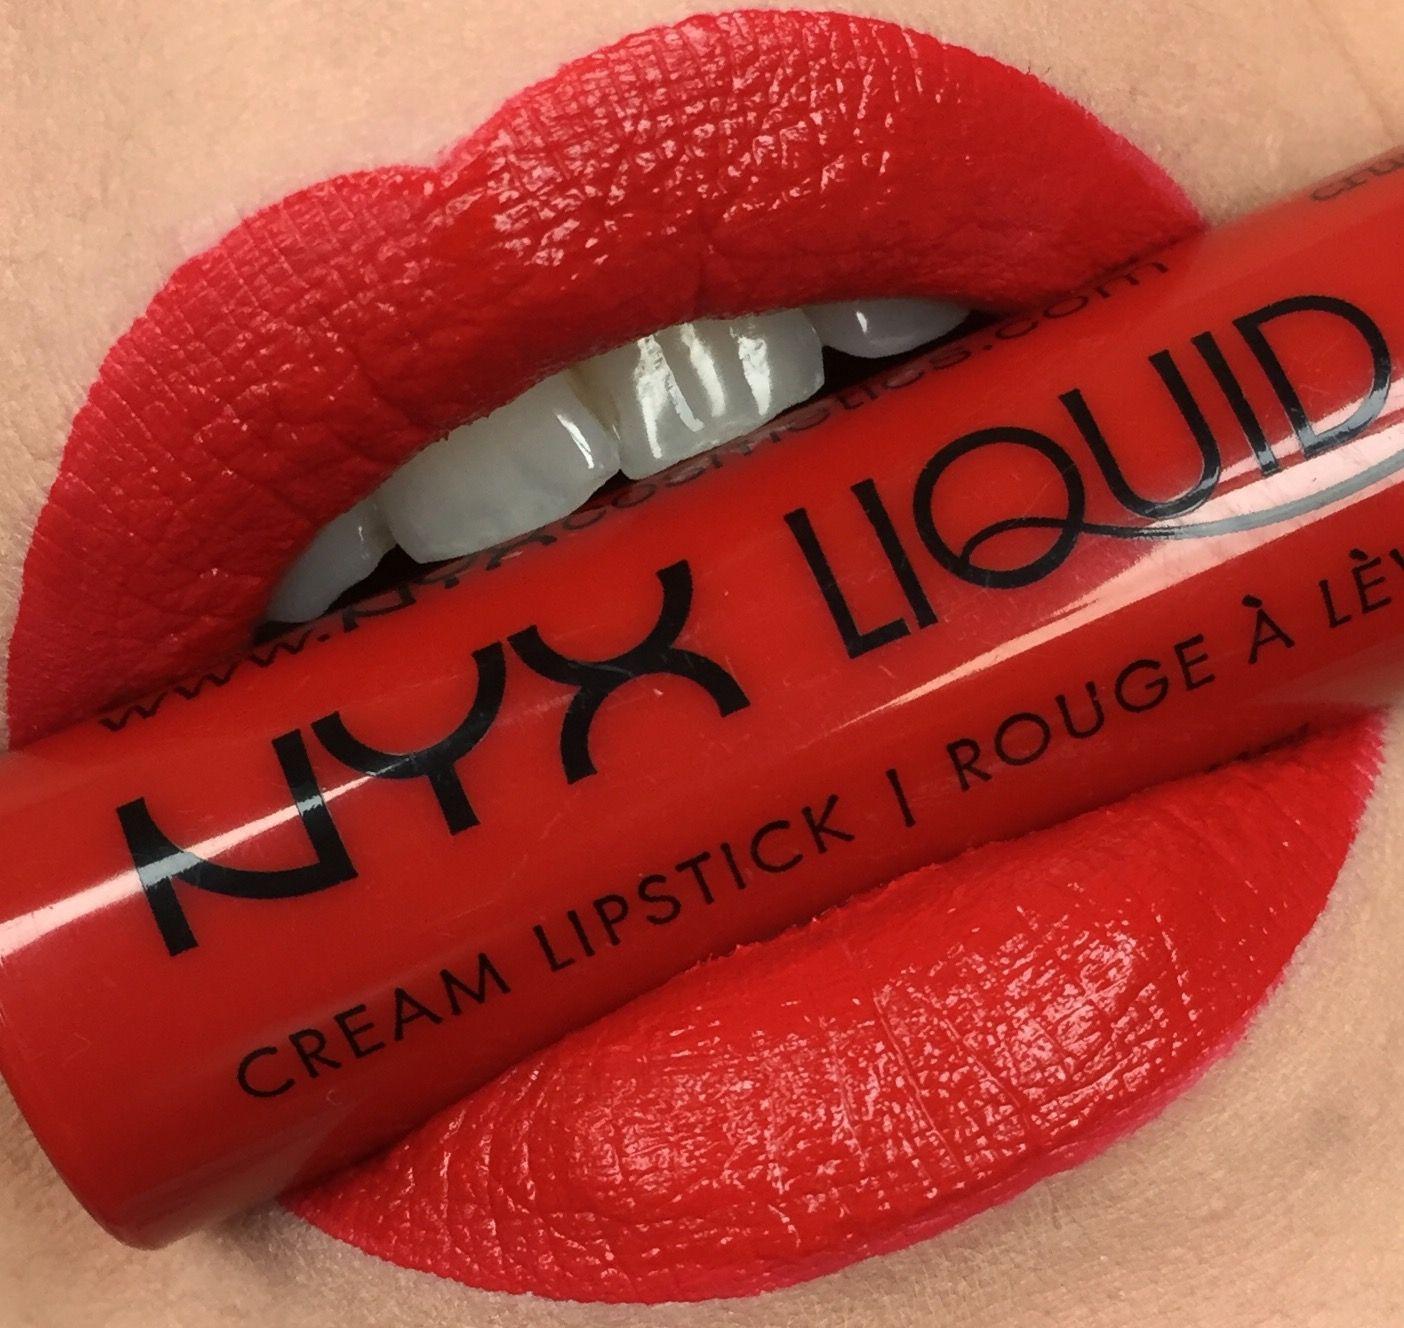 Nyx Cosmetics Liquid Suede Cream Lipstick Kitten Heels Lips Swatch Lipswatch Nyxcosmetics Nyxliquidsuedecreamlipstick Lipstickswatch Nyxkittenheels